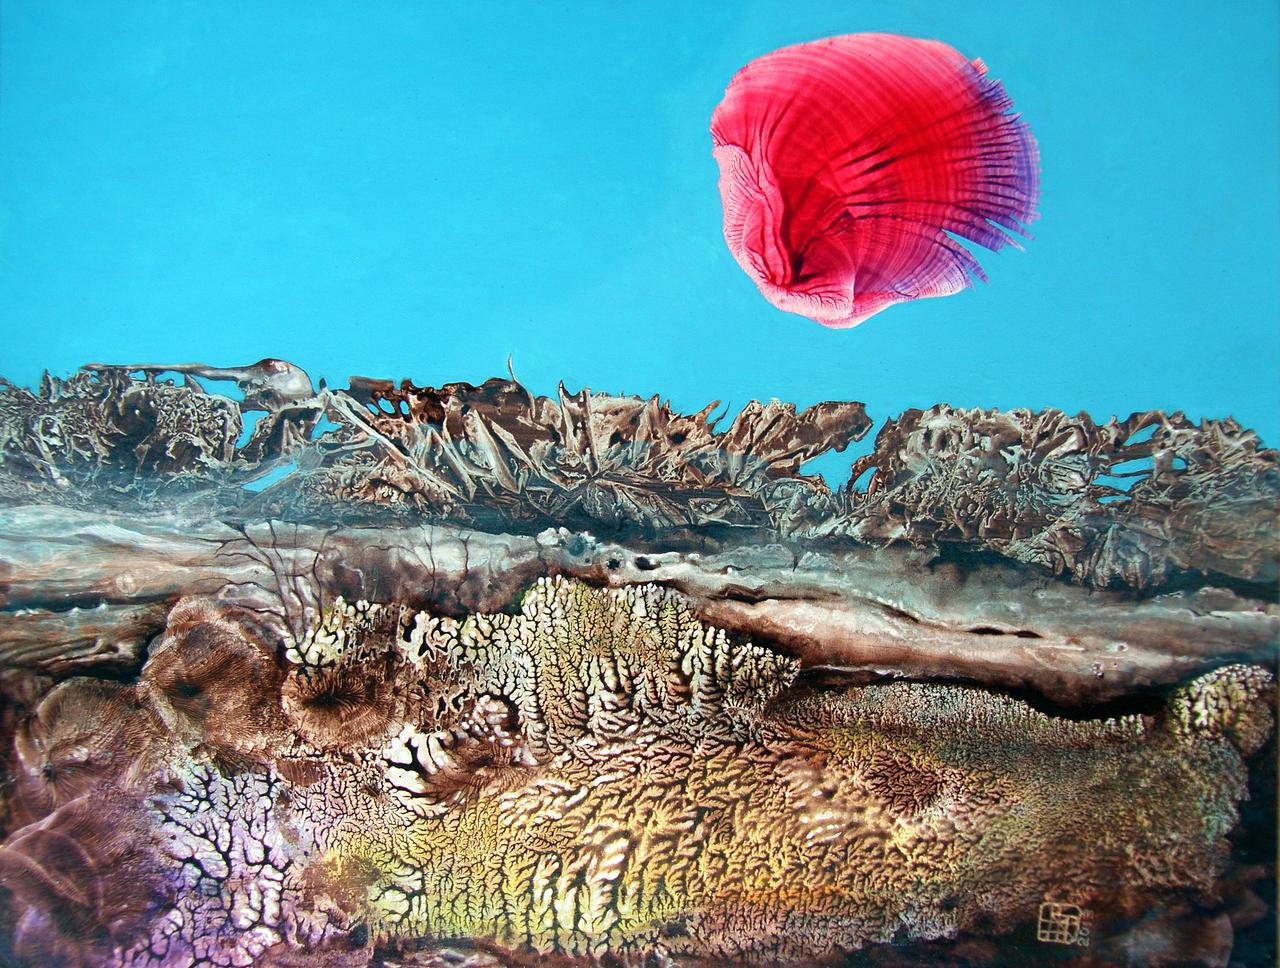 BOGOMIL SUNRISE - VERSION 2 by ArtOfTheMystic